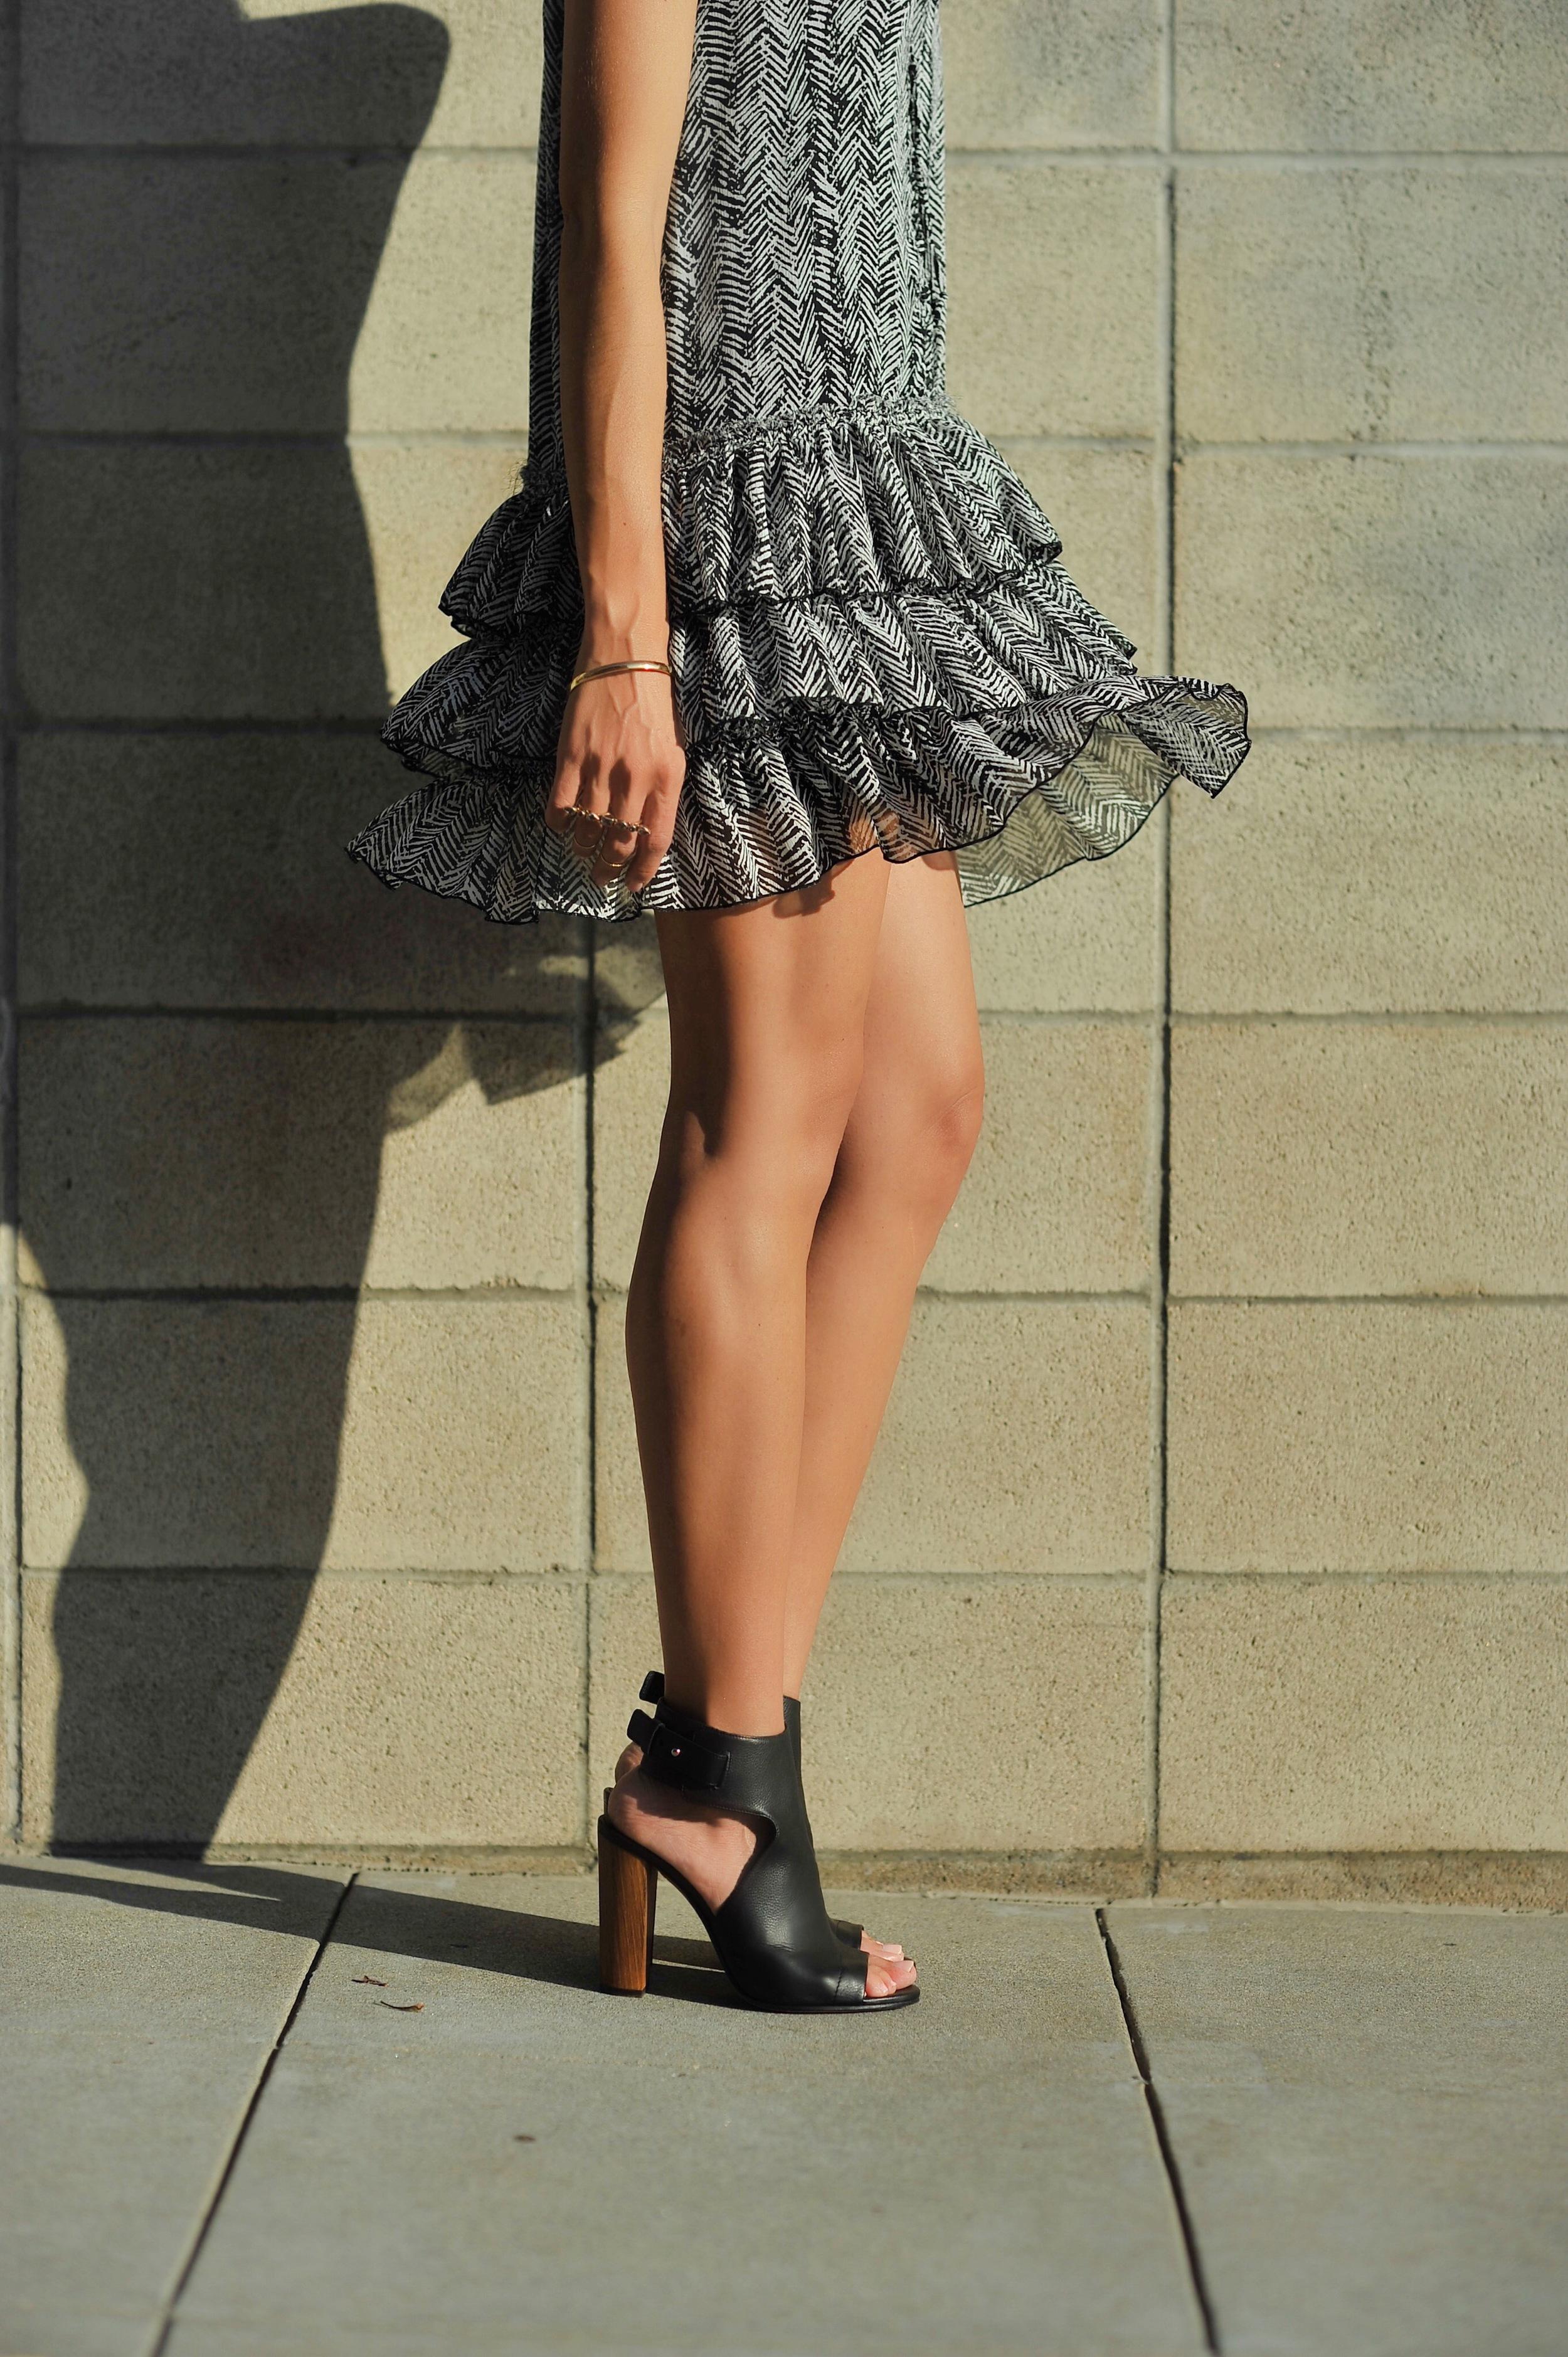 Zara_Dress_VinceShoes_Concrete_jpg